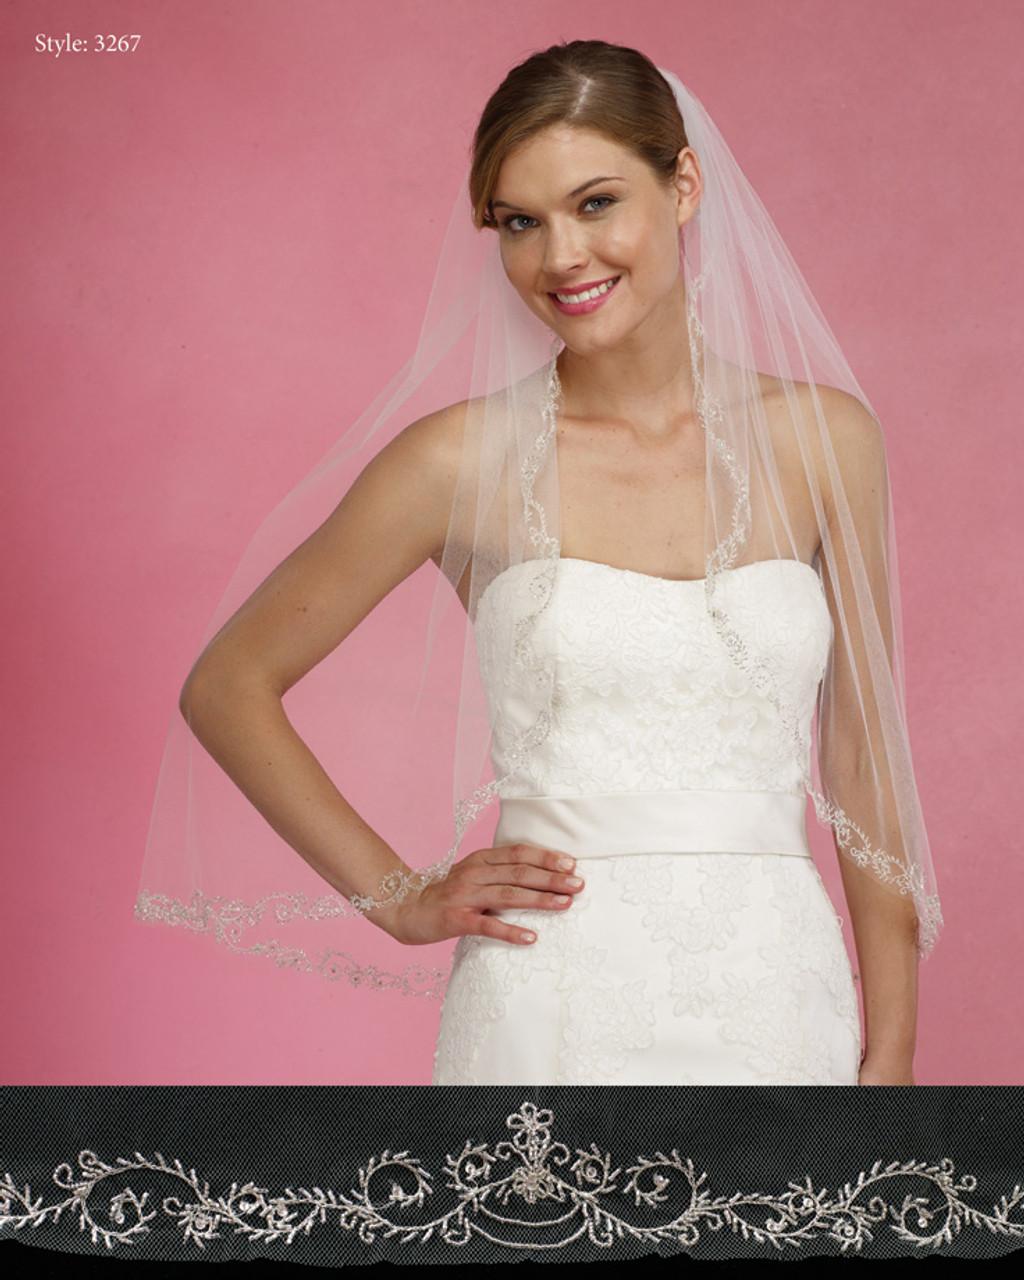 Marionat Bridal Veils 3267- The Bridal Veil Company - Beaded Embroidery